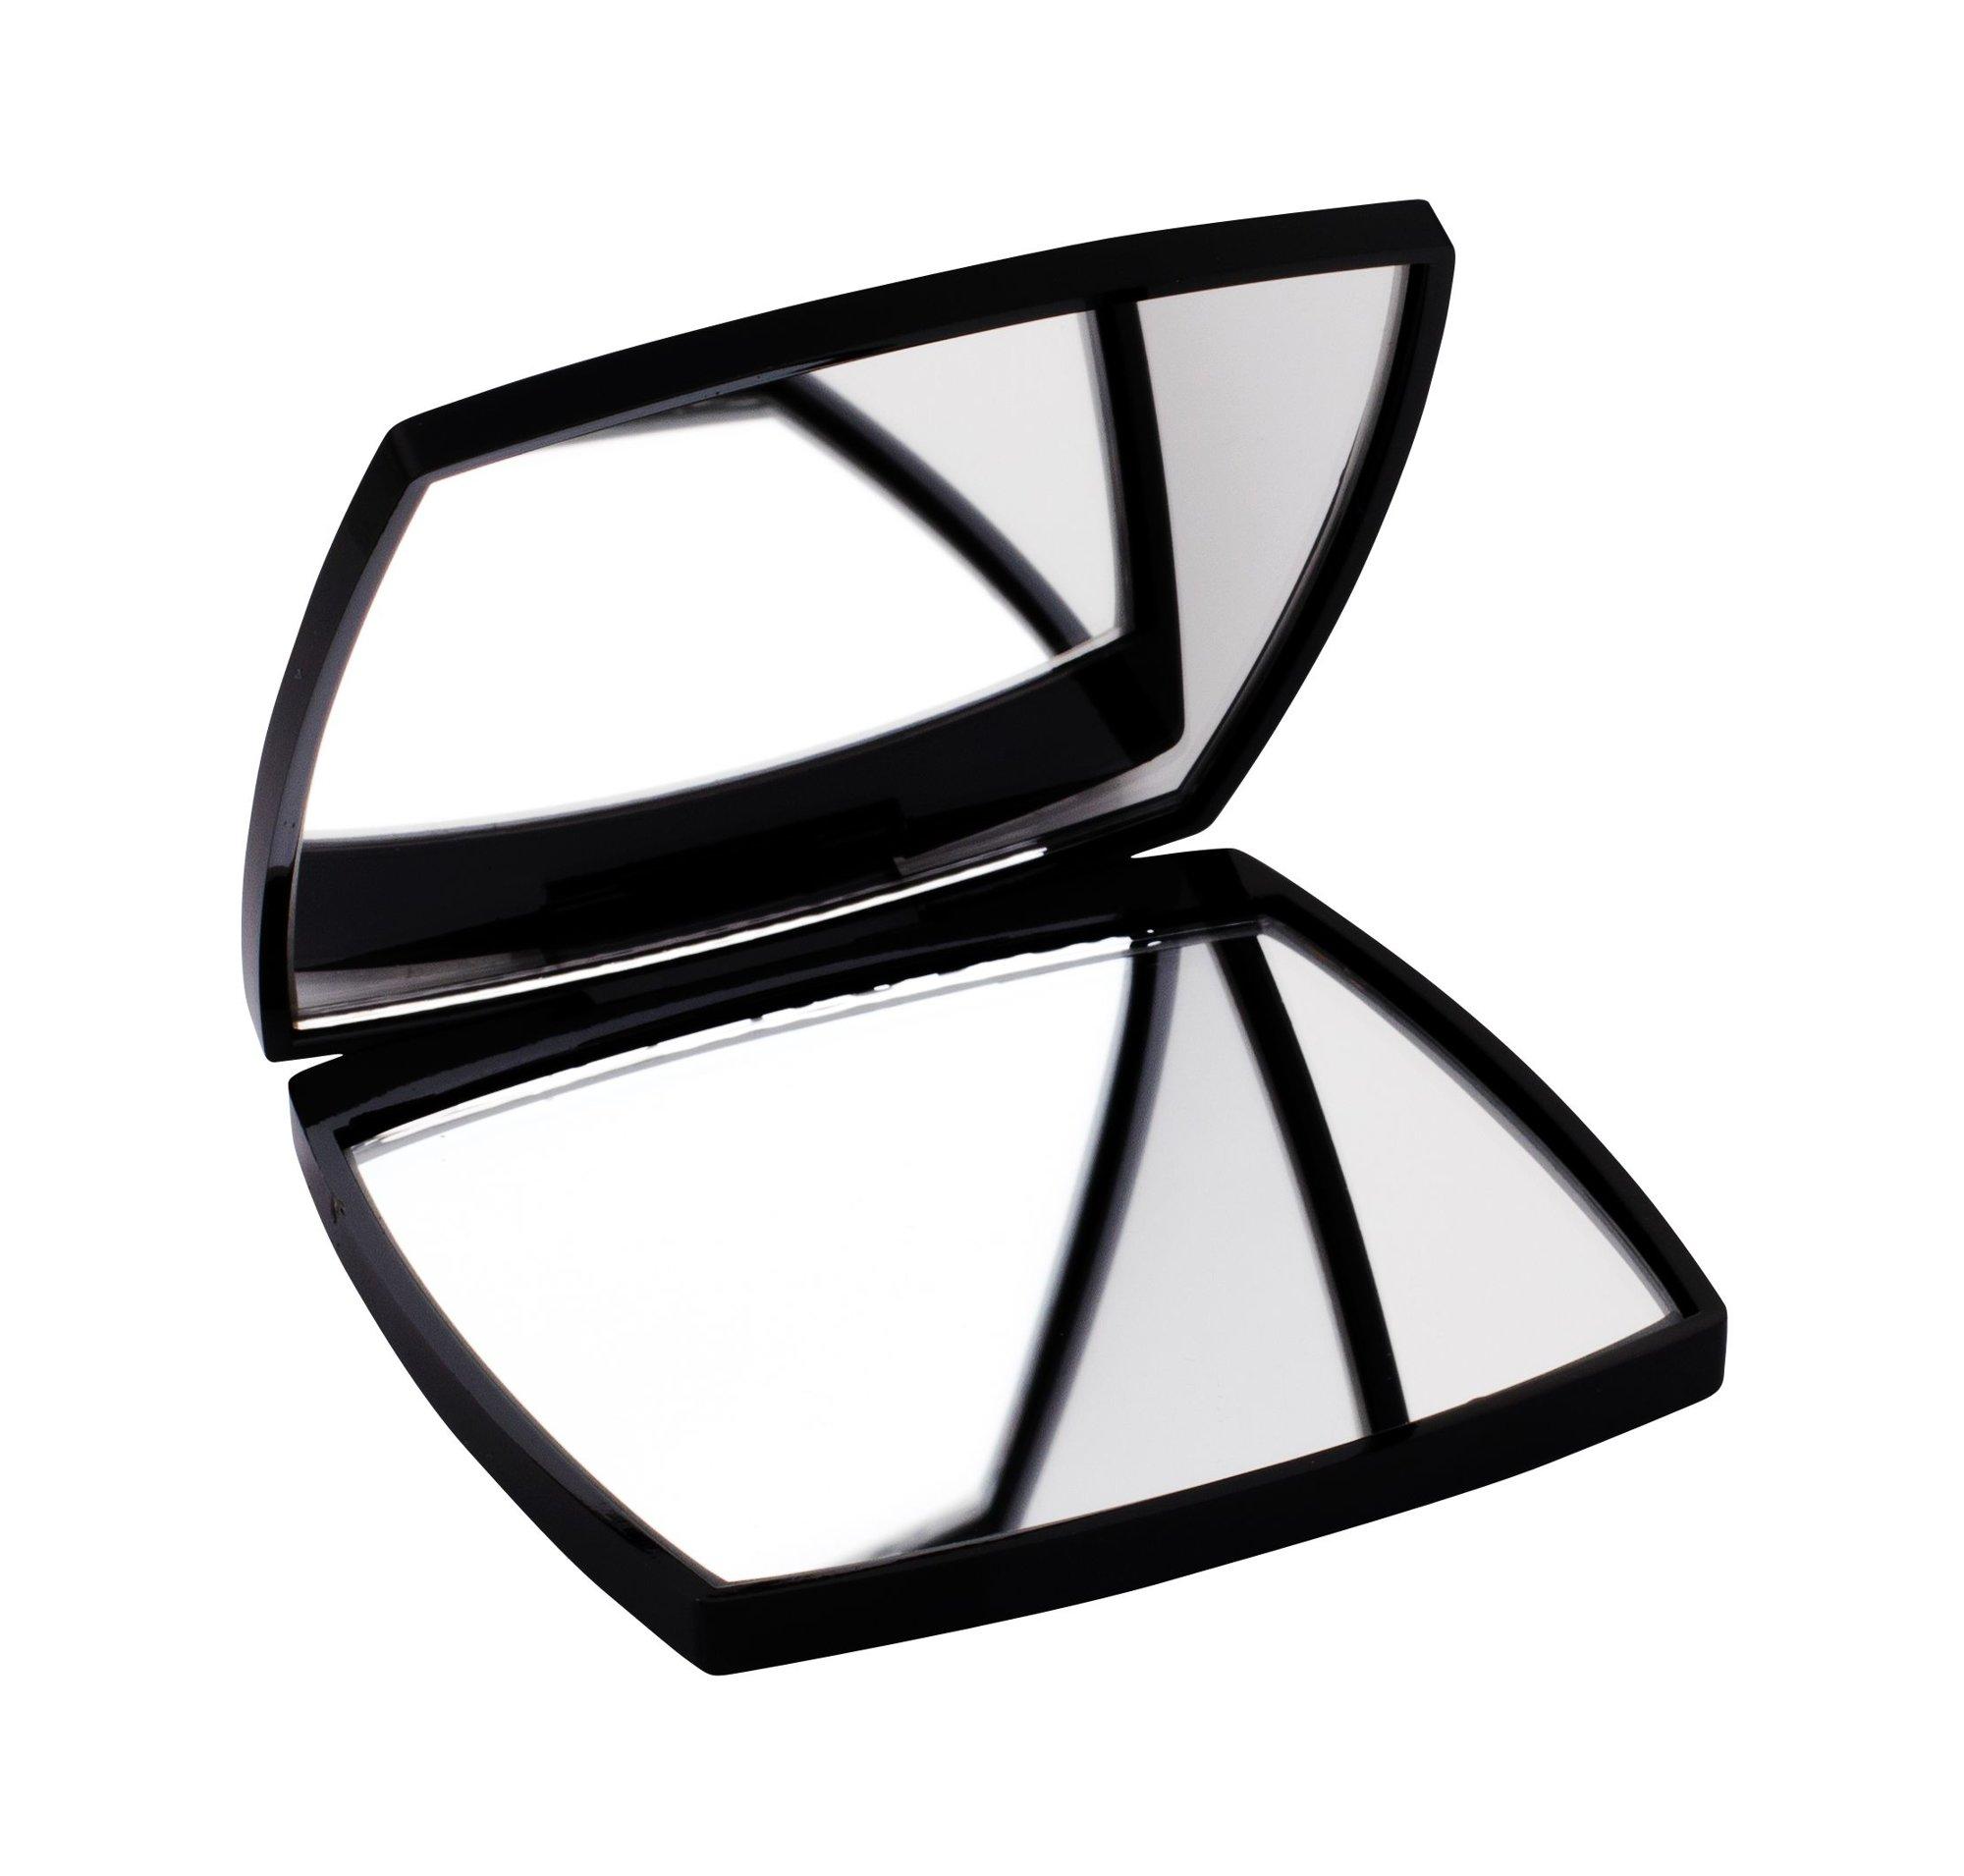 Chanel Miroir Double Facettes Mirror 1ml